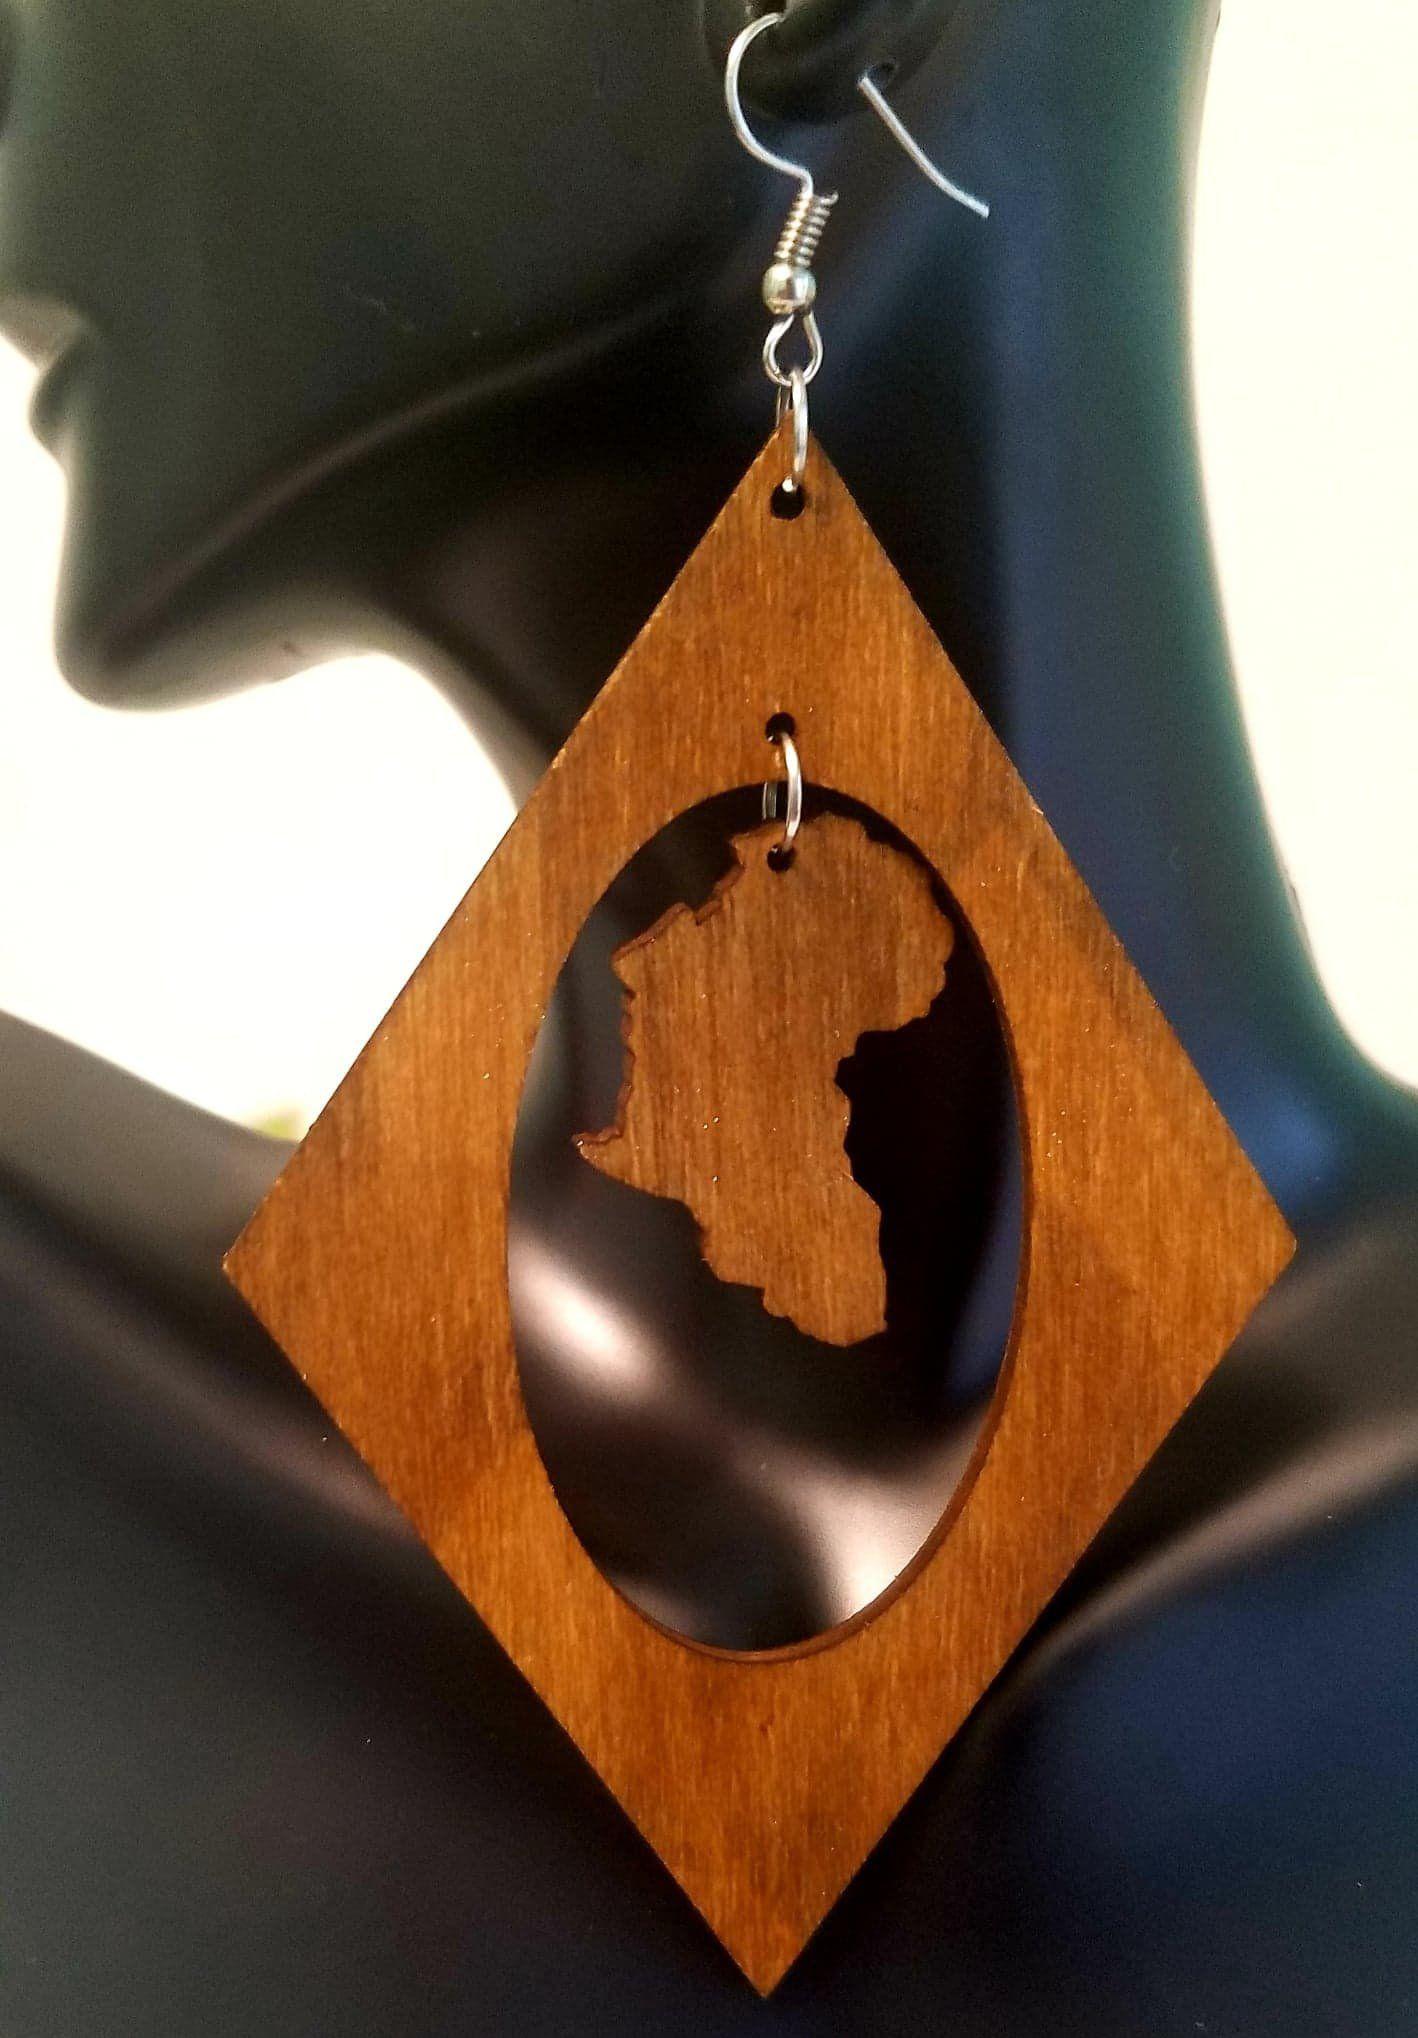 Body piercing map  Open African Map Dangle Drop Diamond Natural Wood Long Earrings